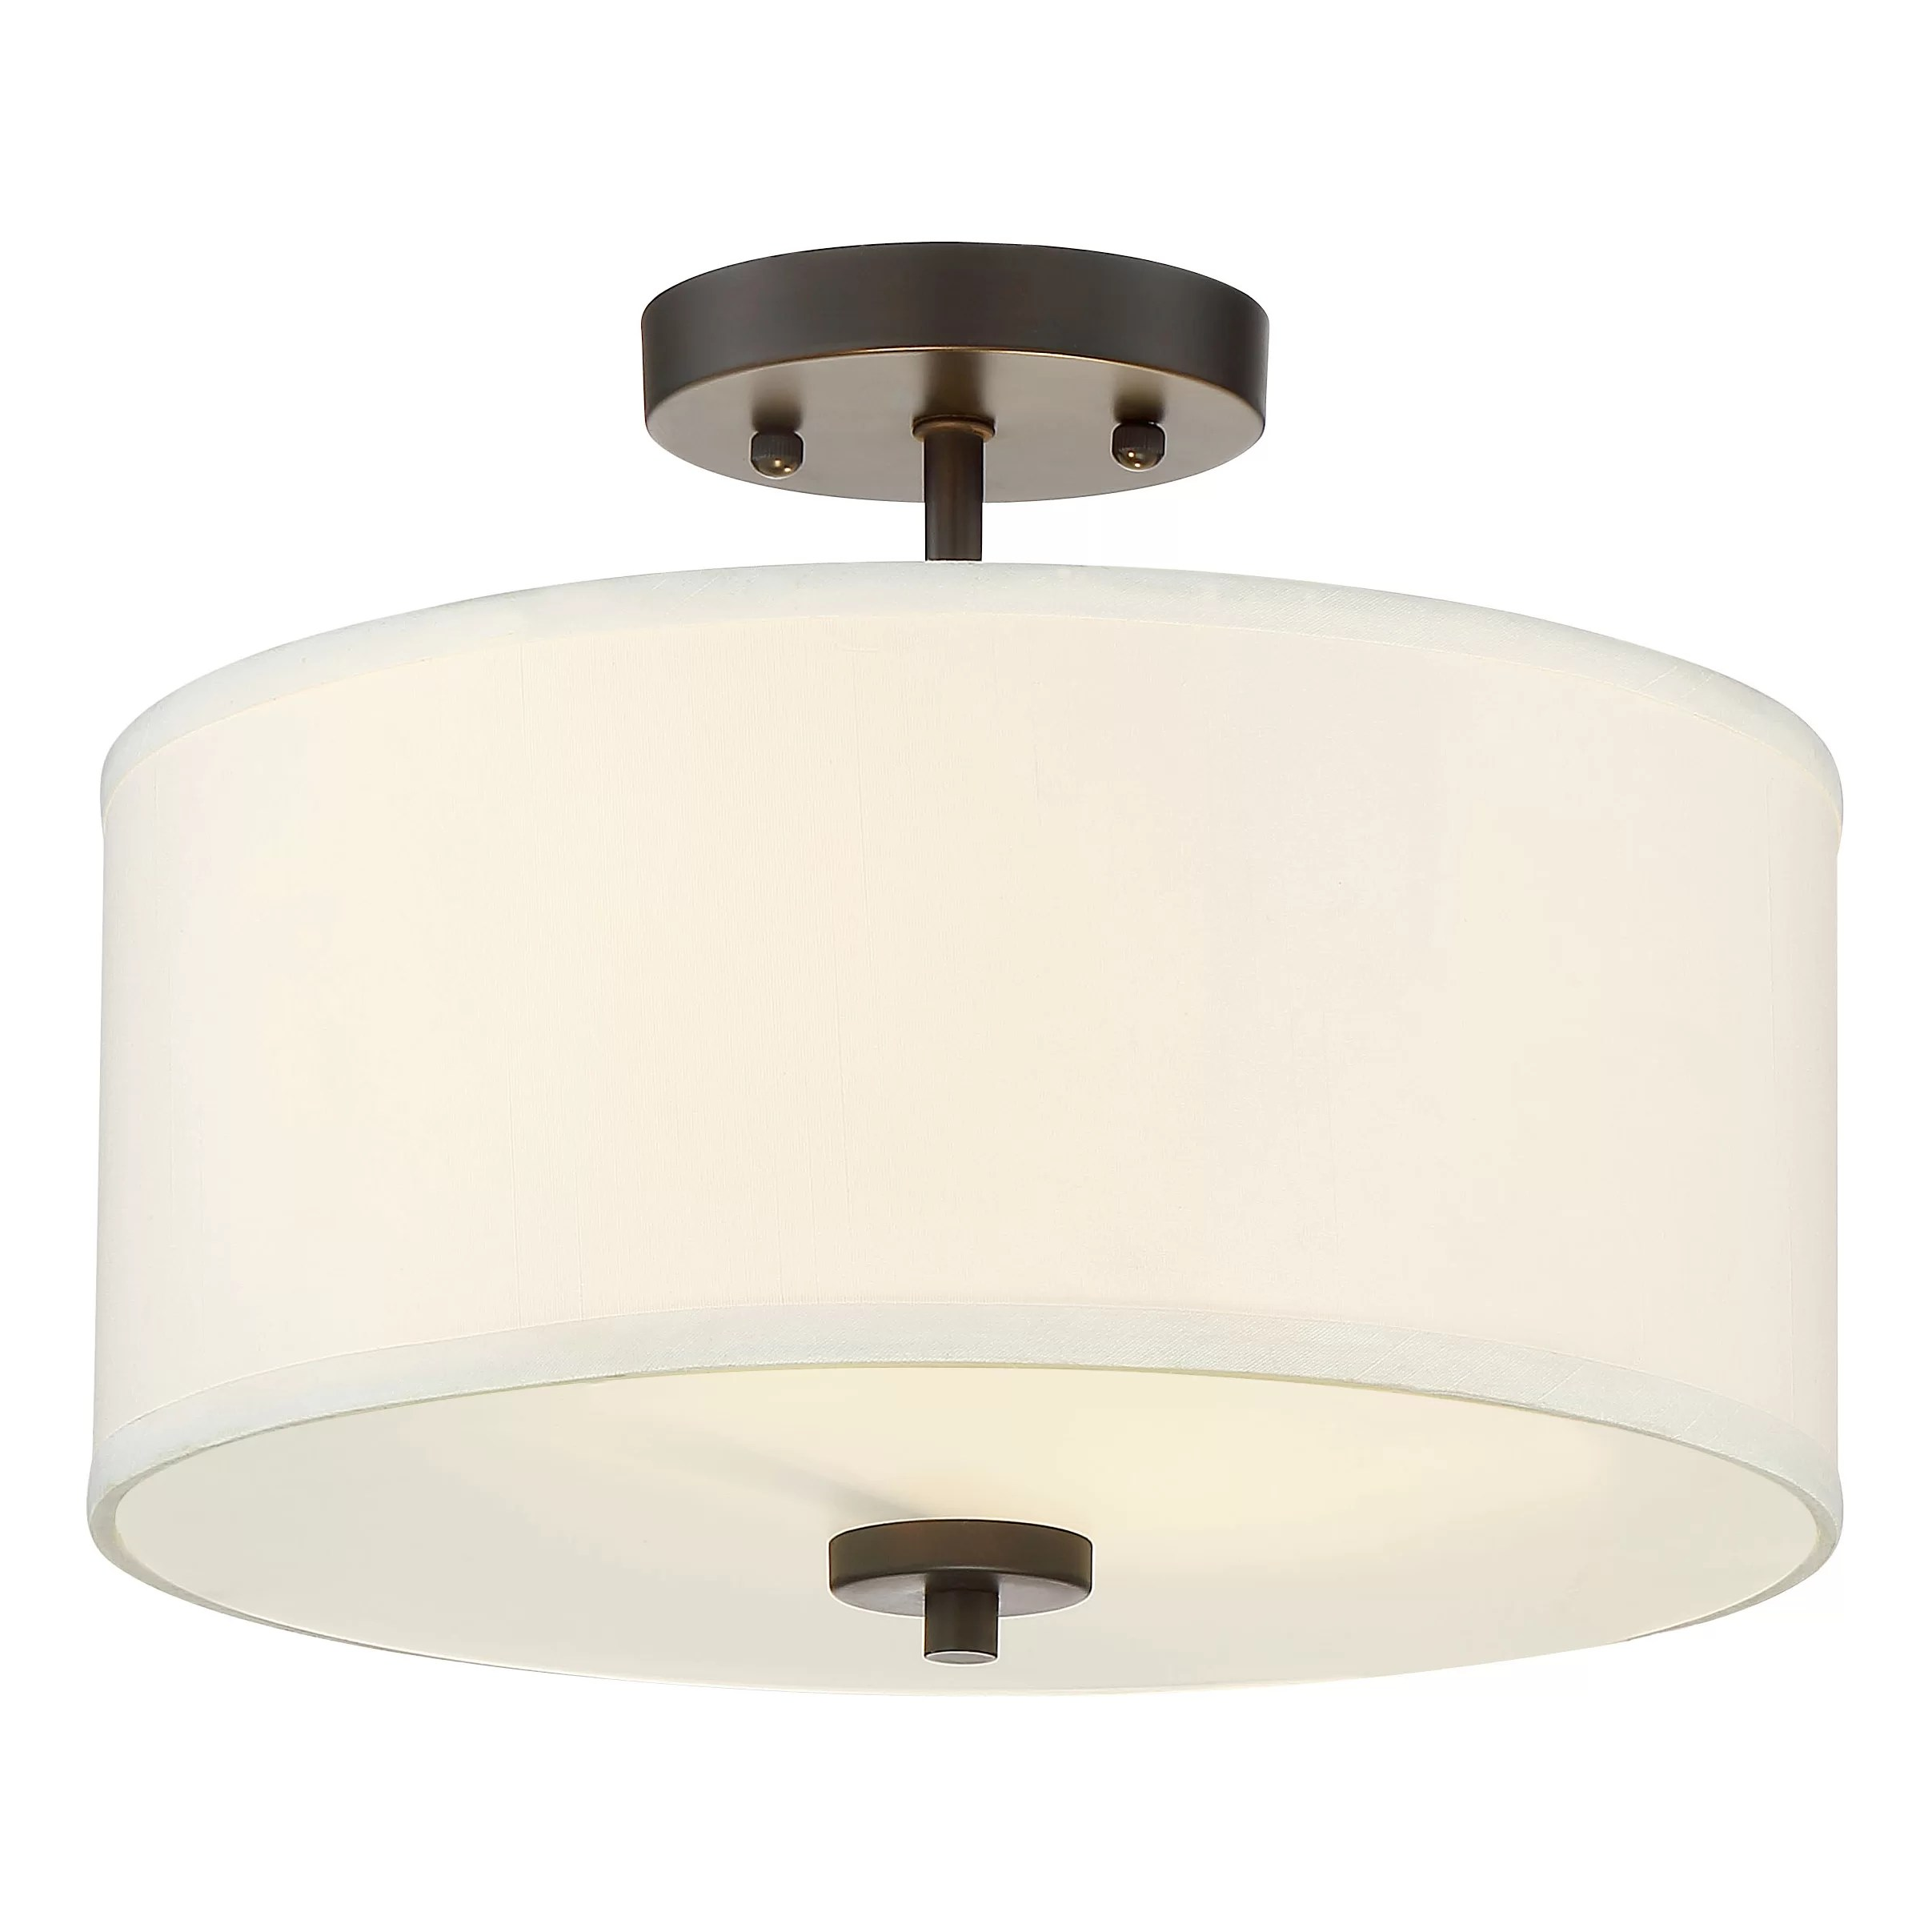 Varick Gallery Lighting